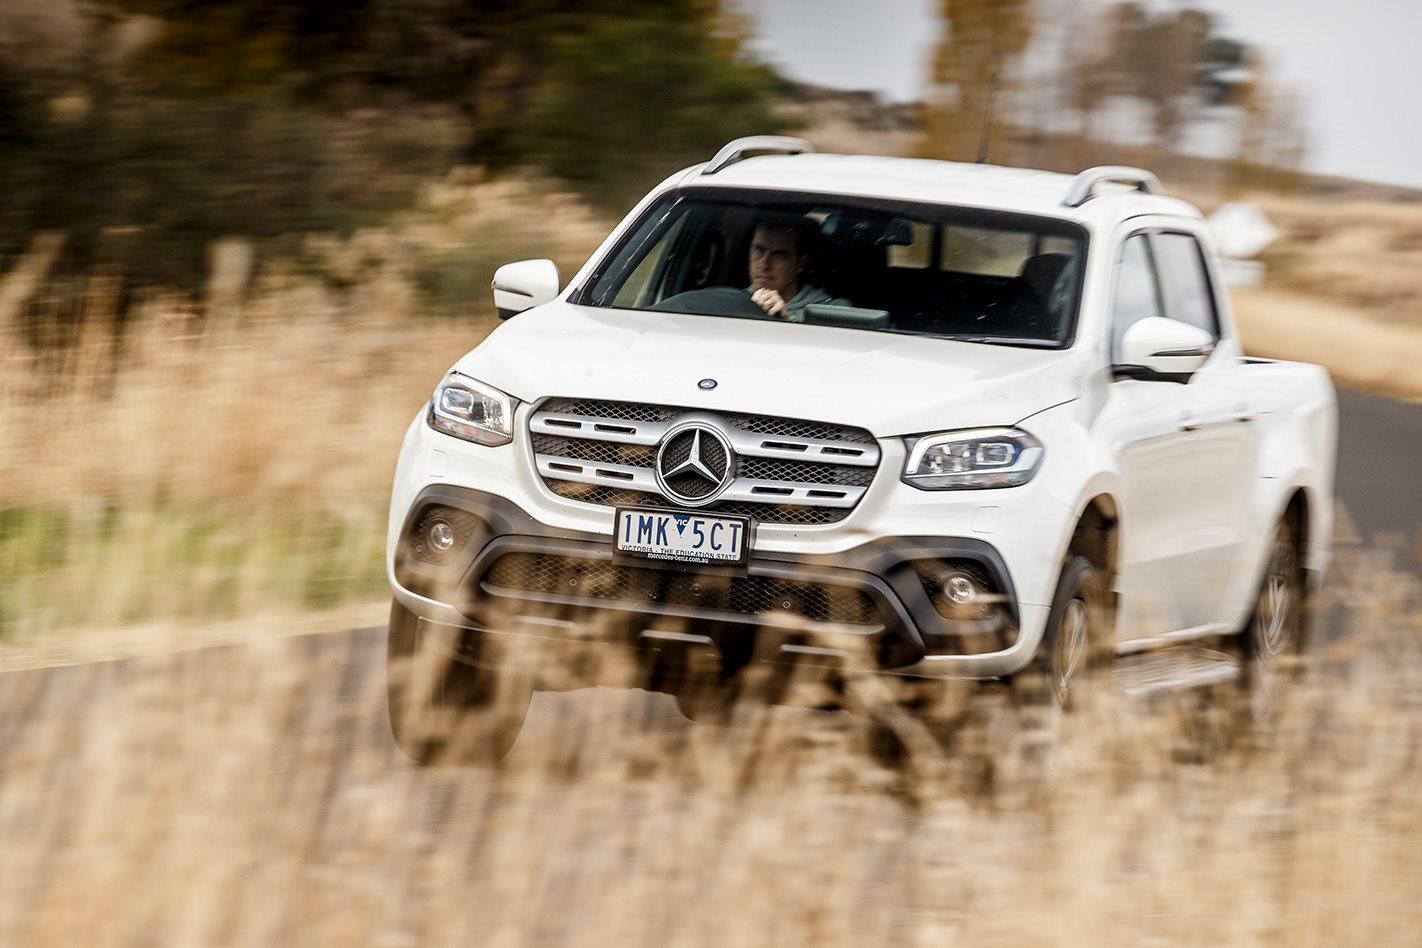 2018 mercedes benz x250d review wheels ute megatest 3rd for Mercedes benz of tucson